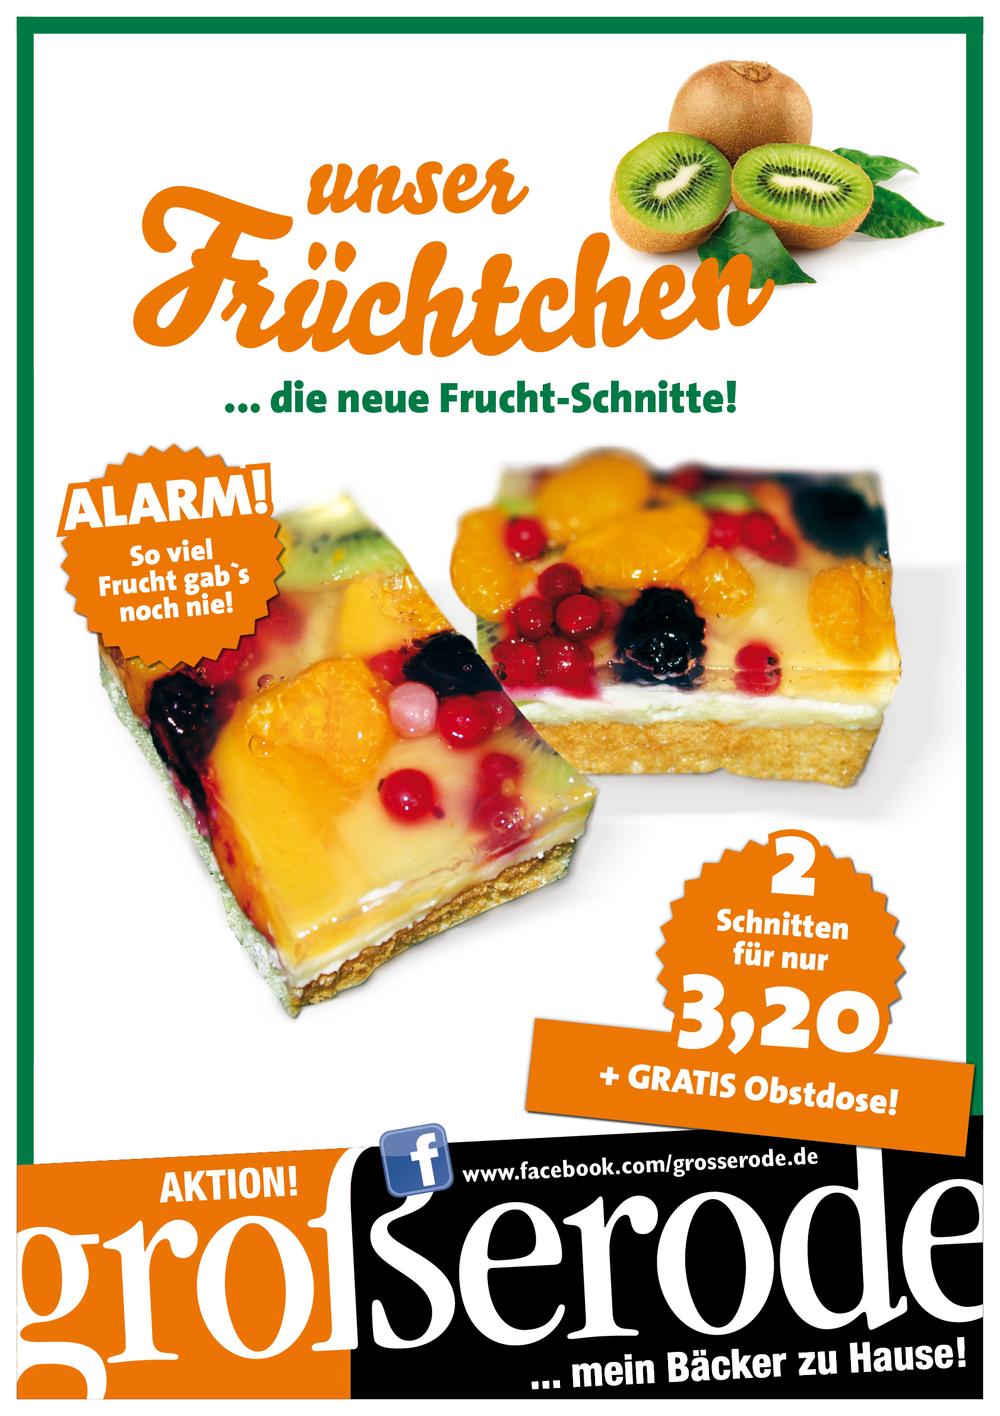 20160217_Grosserode_Fruechtchen_Web.png